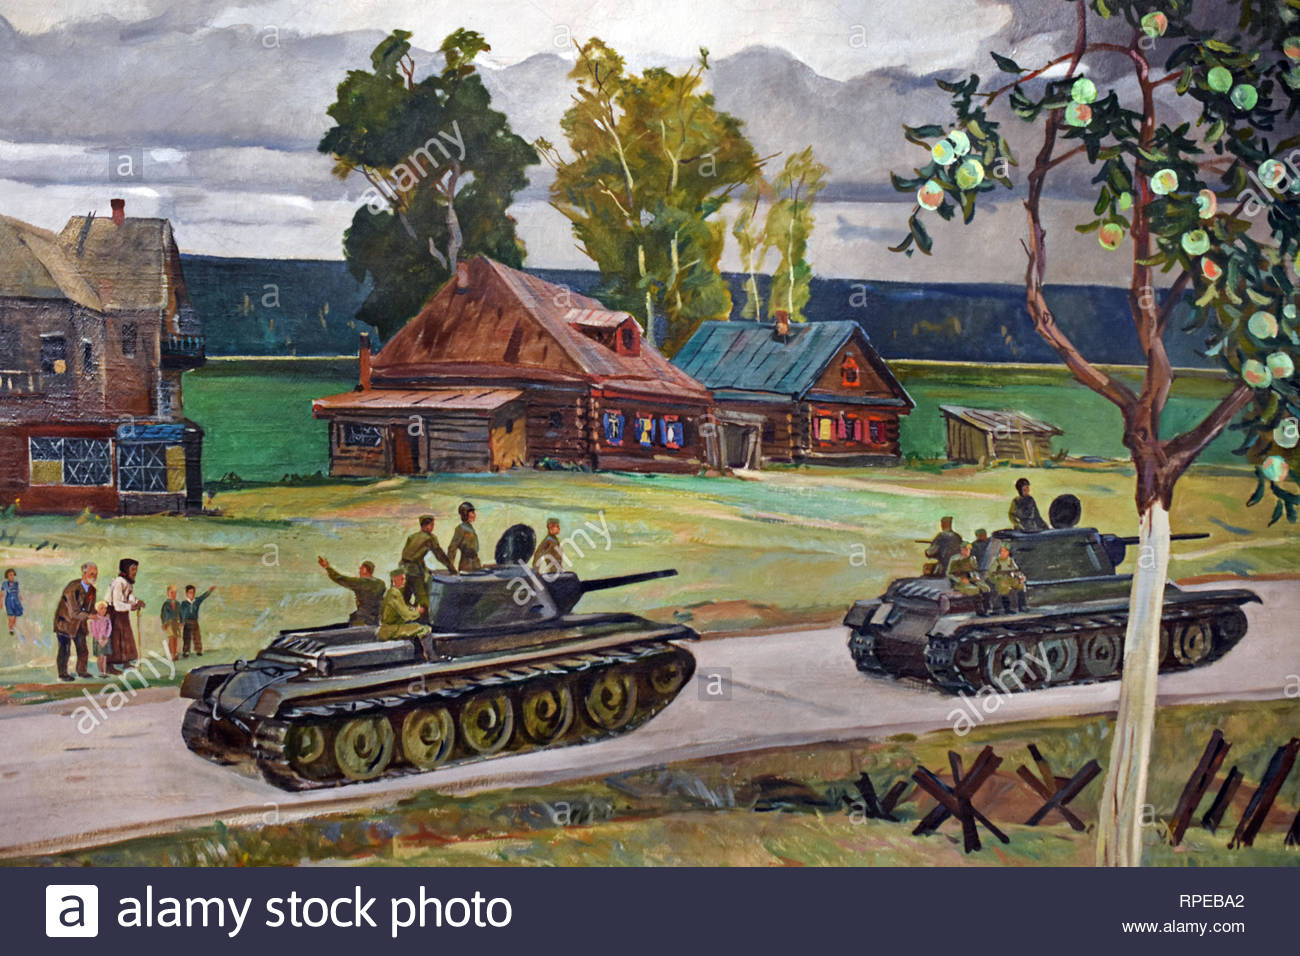 The People in the great patriotic War 1948. Aleksandr Deyneka -Aleksandrovich Deyneka. Soviet Union Communist Propaganda (Russia under Lenin and Stalin 1921-1953 ). - Stock Image